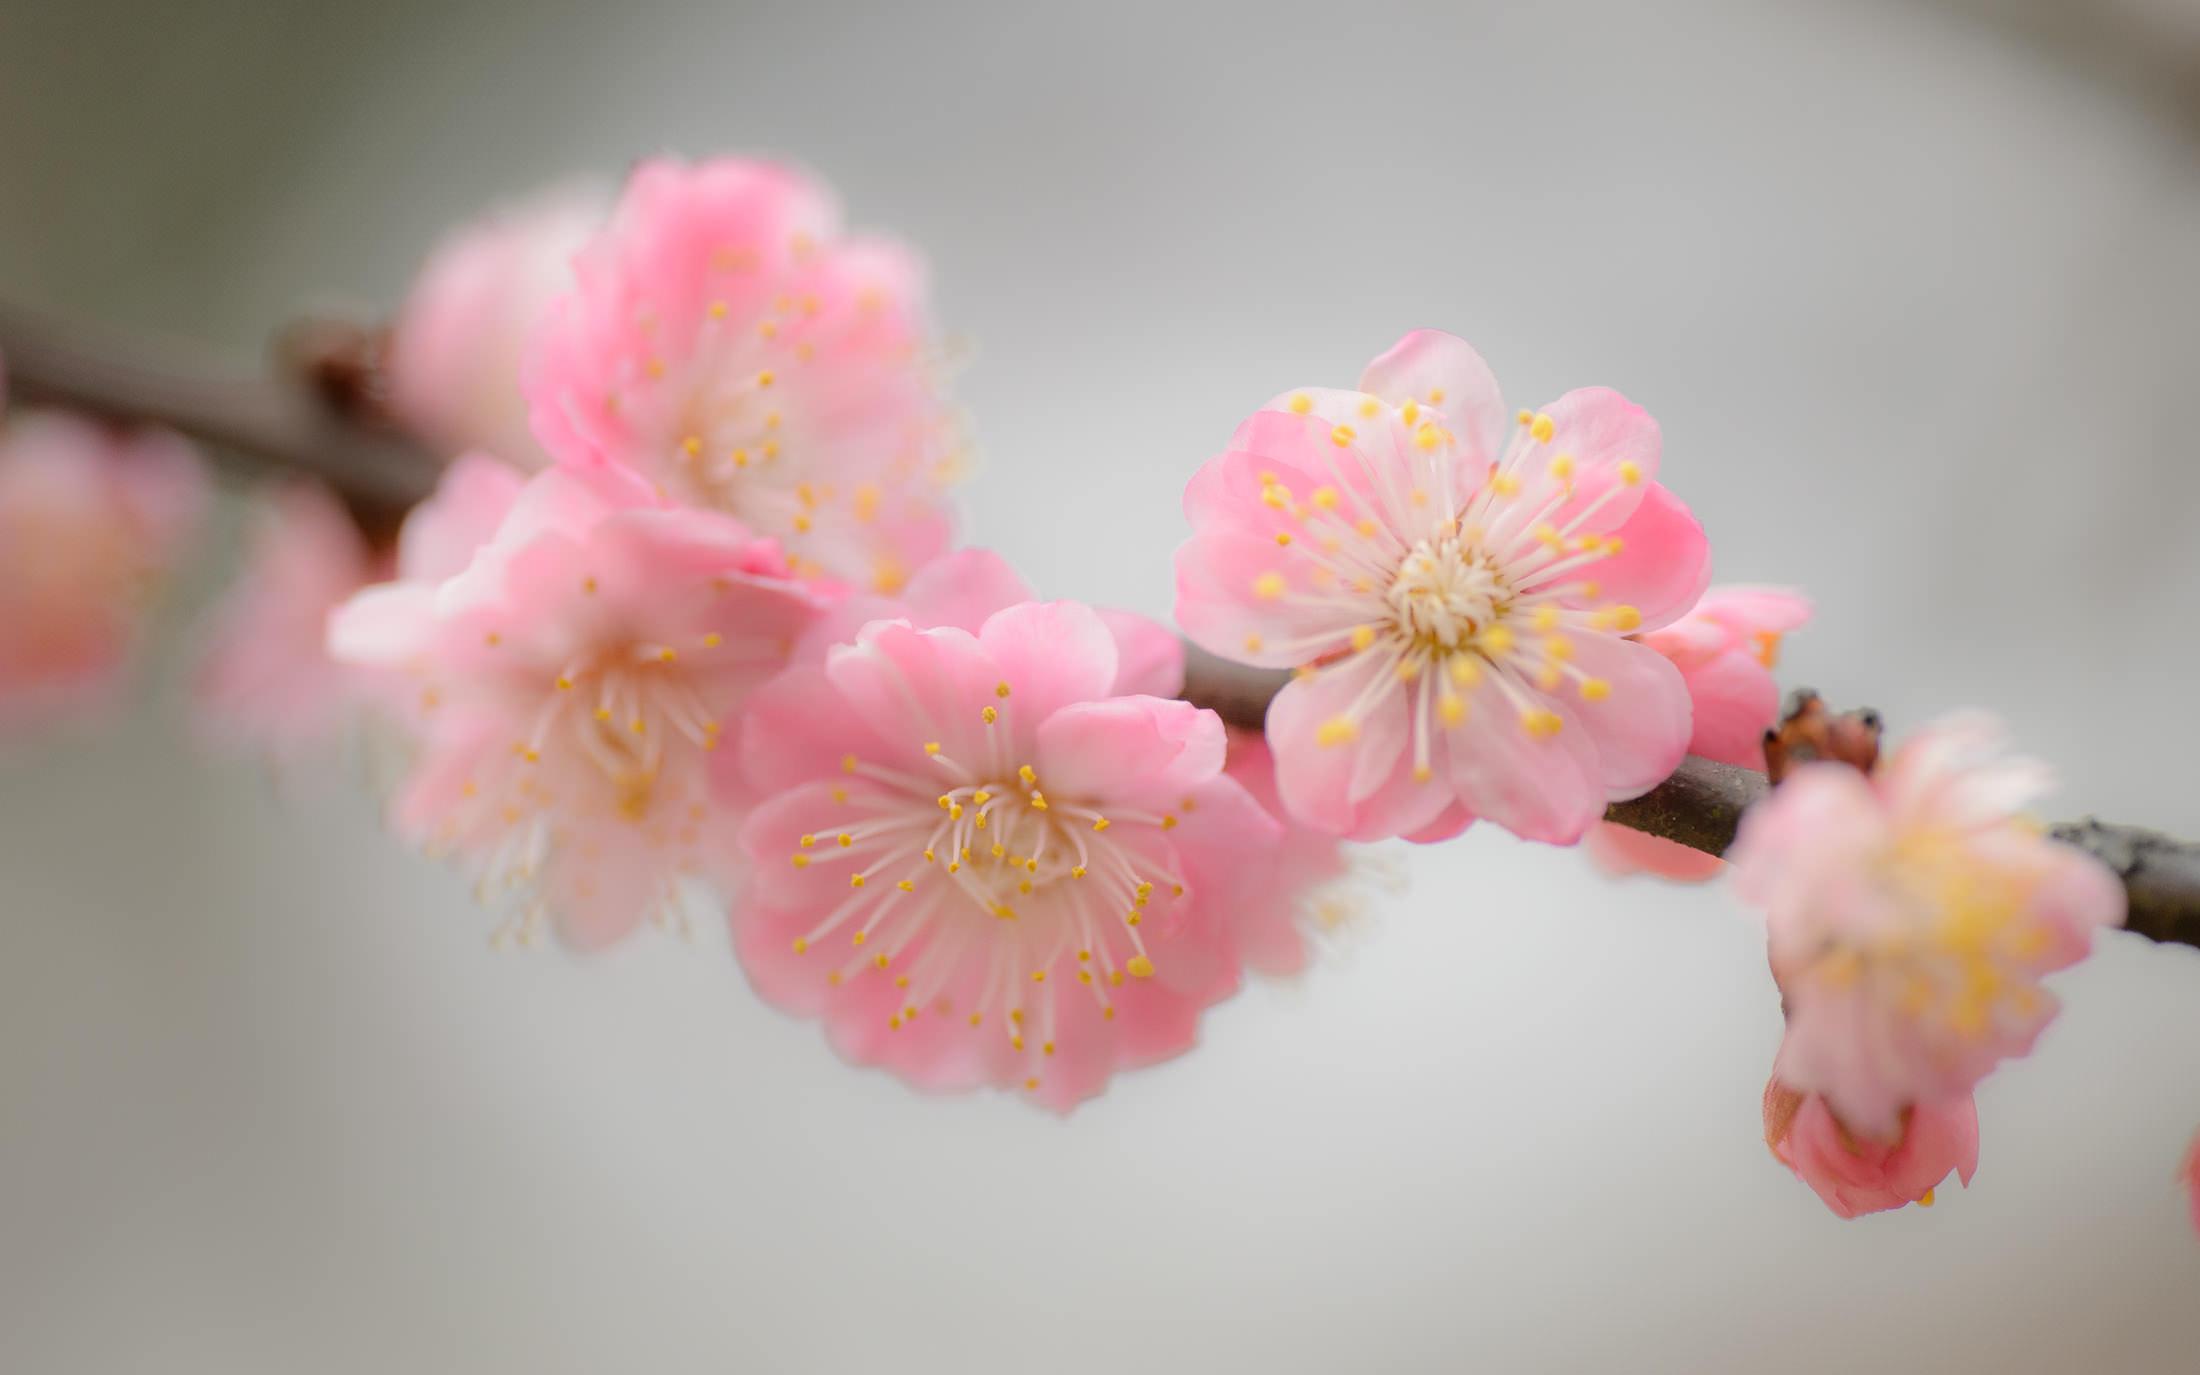 jeffrey friedl u0026 39 s blog  u00bb photoshoot with ikuko among the plum blossoms  part 1